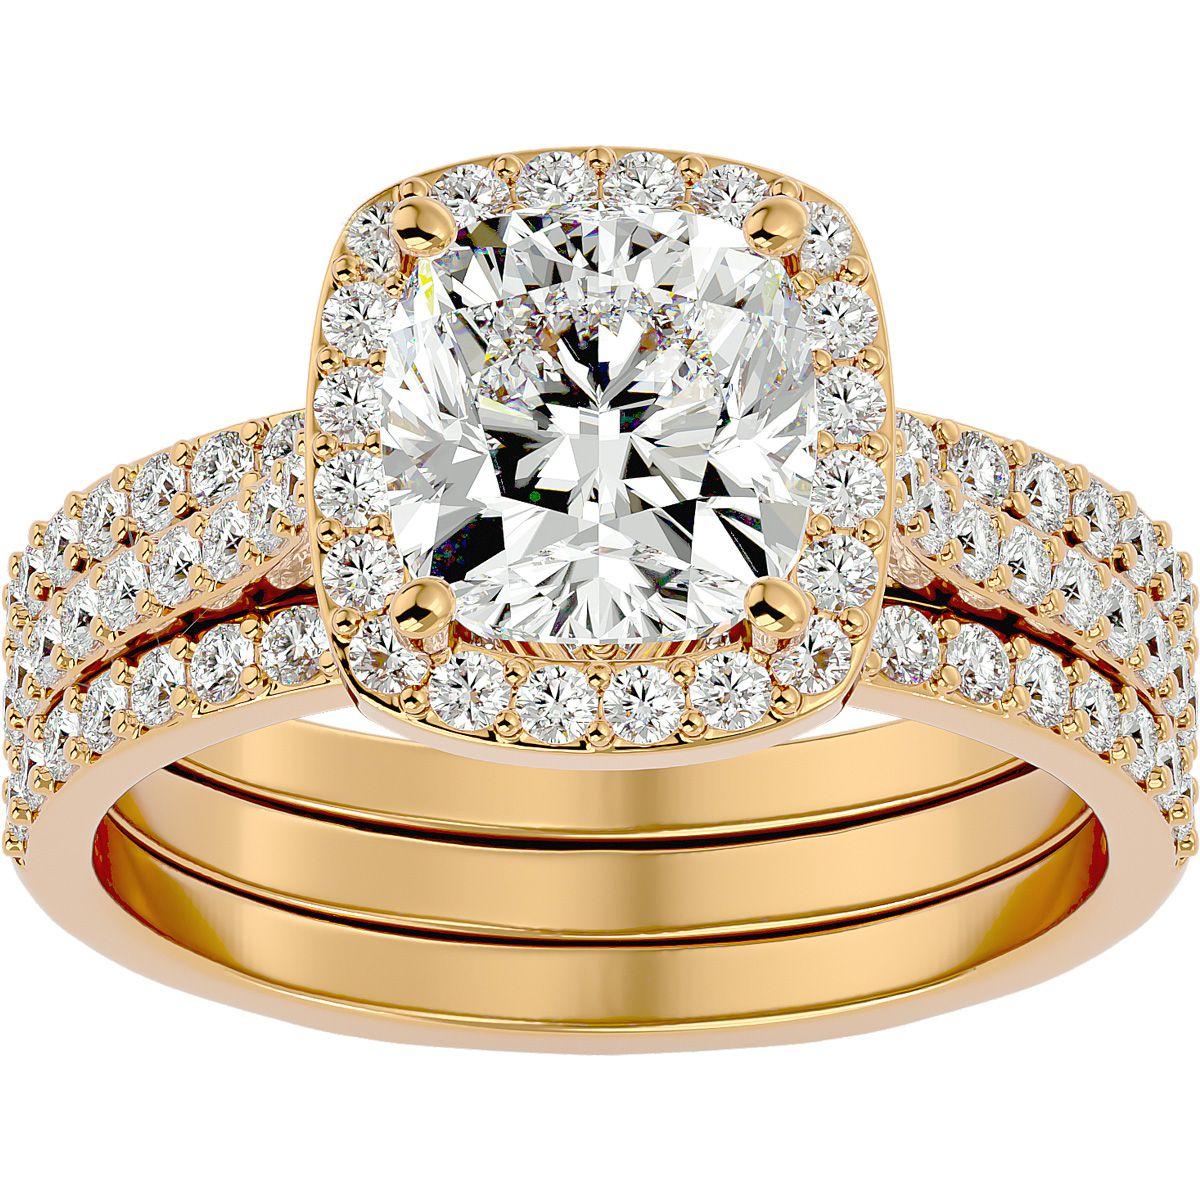 3 Carat Cushion Cut Halo Diamond Bridal Engagement Ring Set in 14K Yellow Gold (16 g), , Size 4 by SuperJeweler